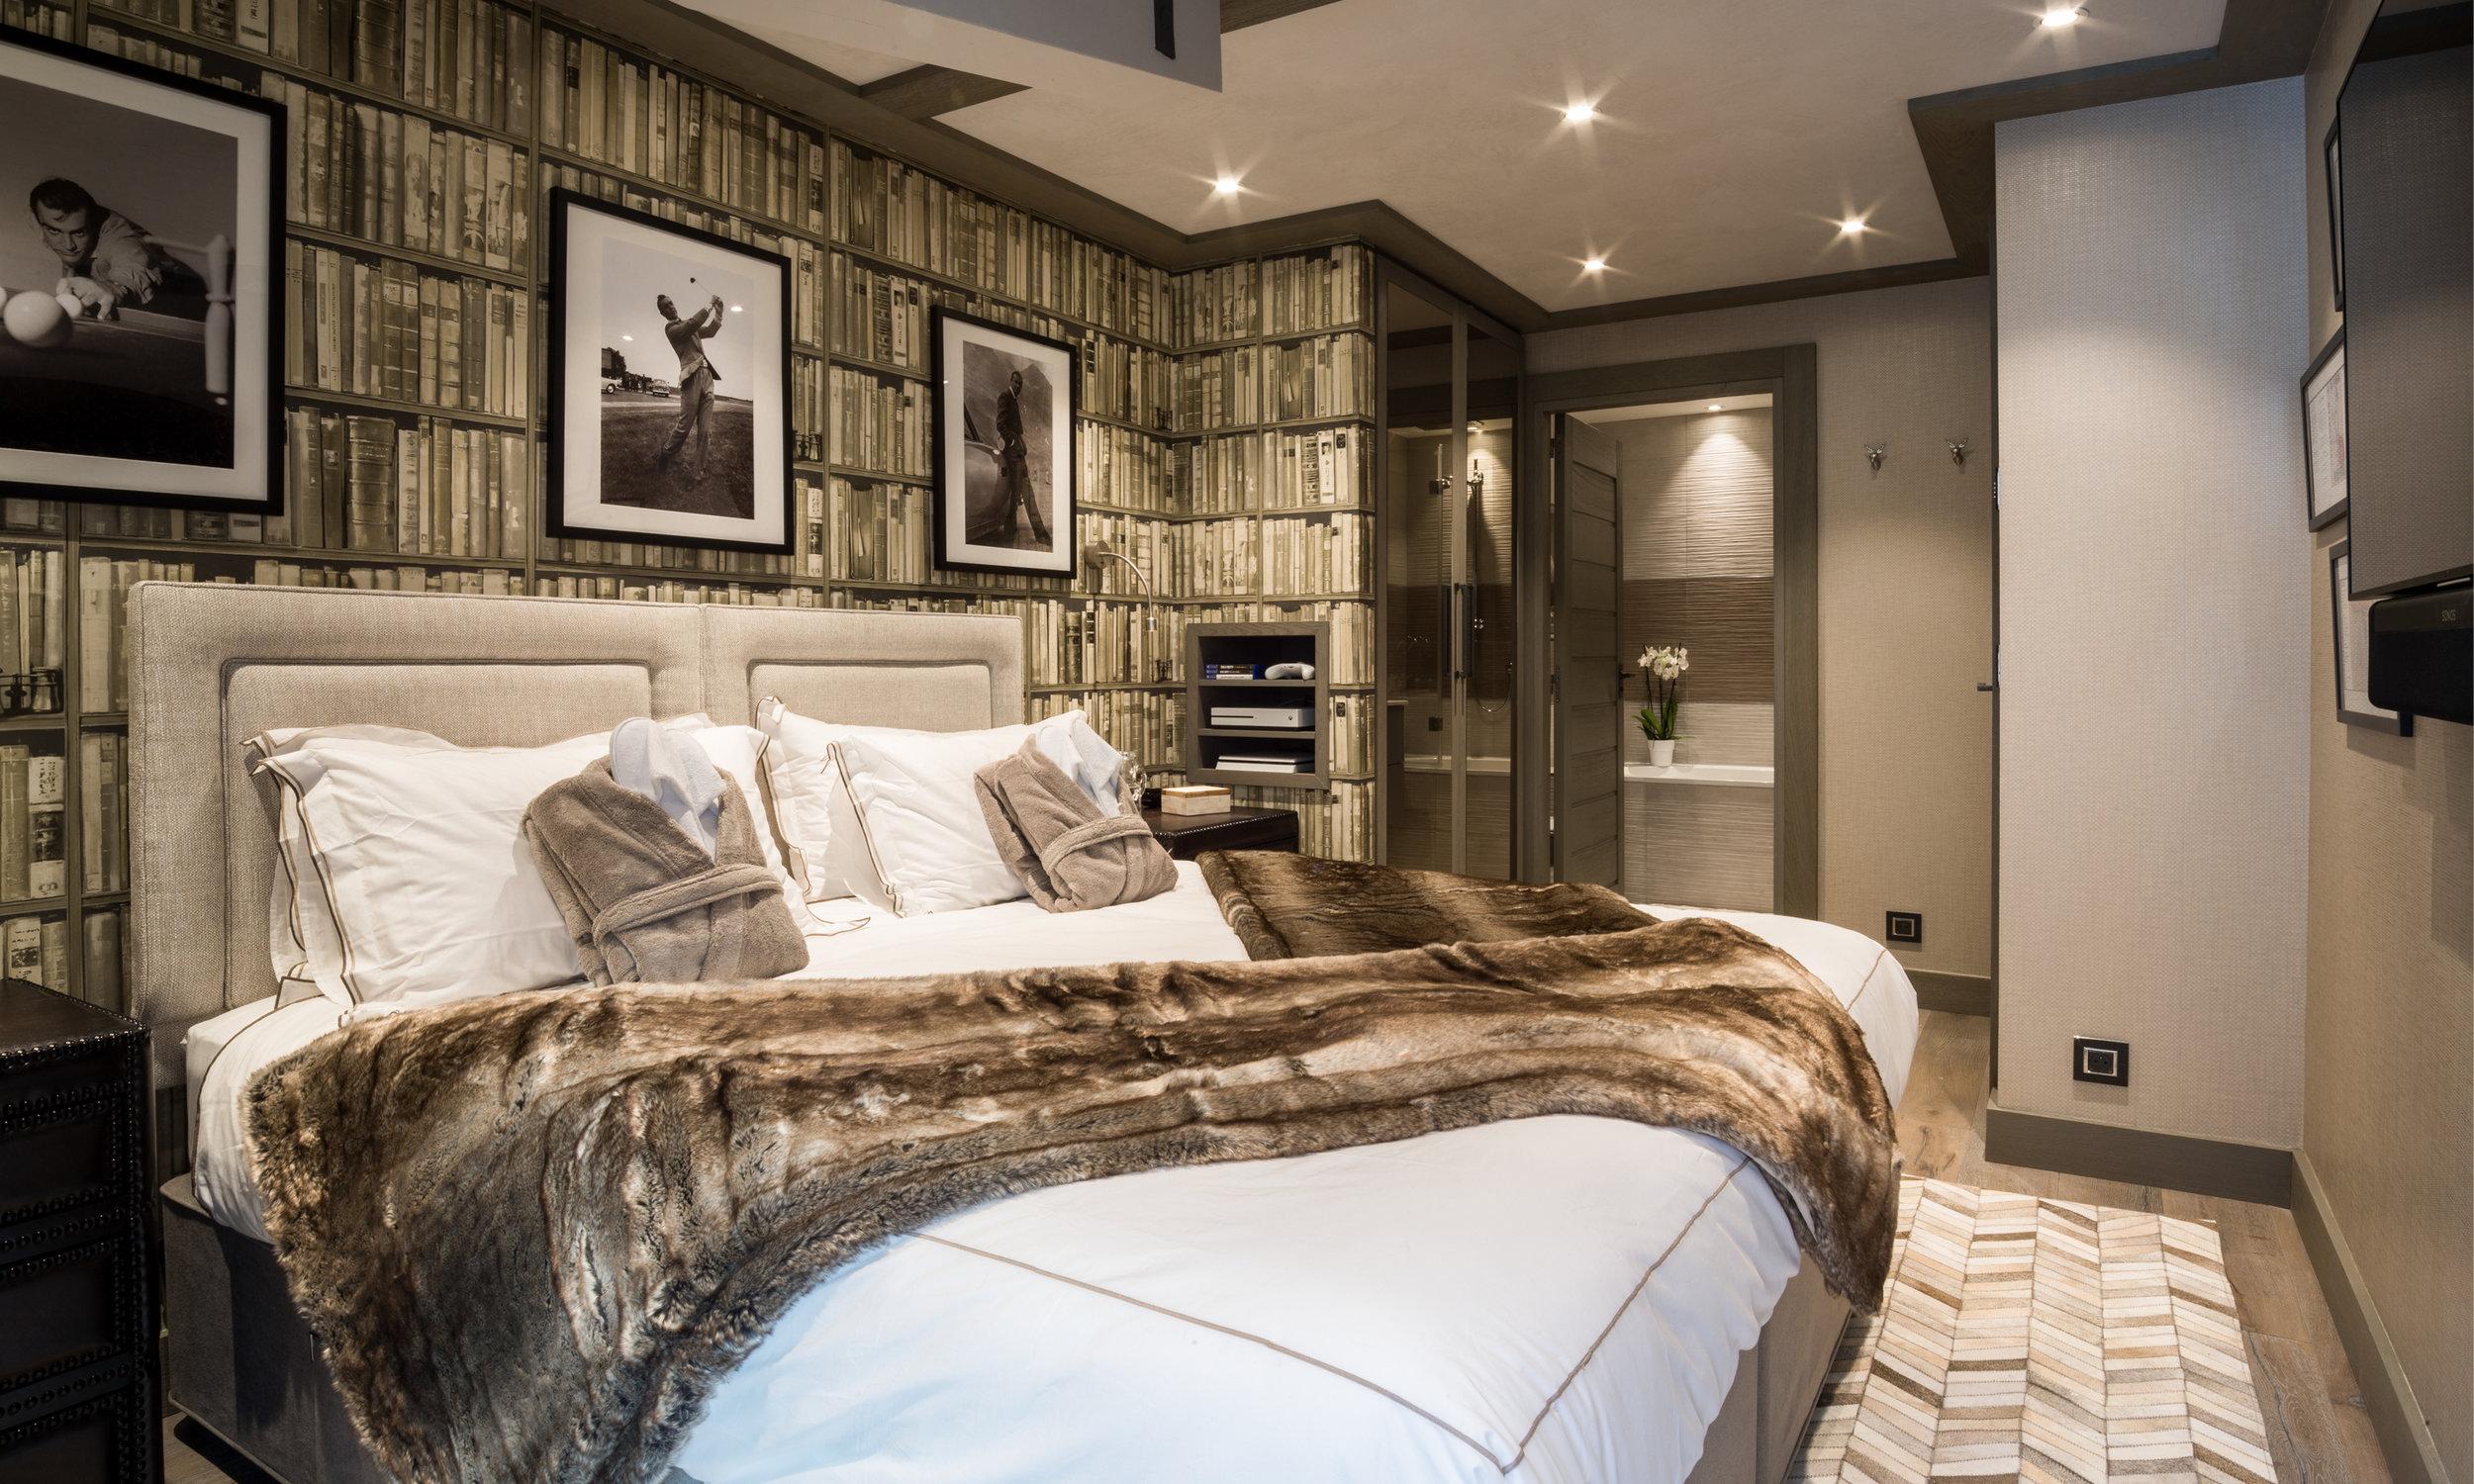 Courchevel Luxury rental superb staterooms